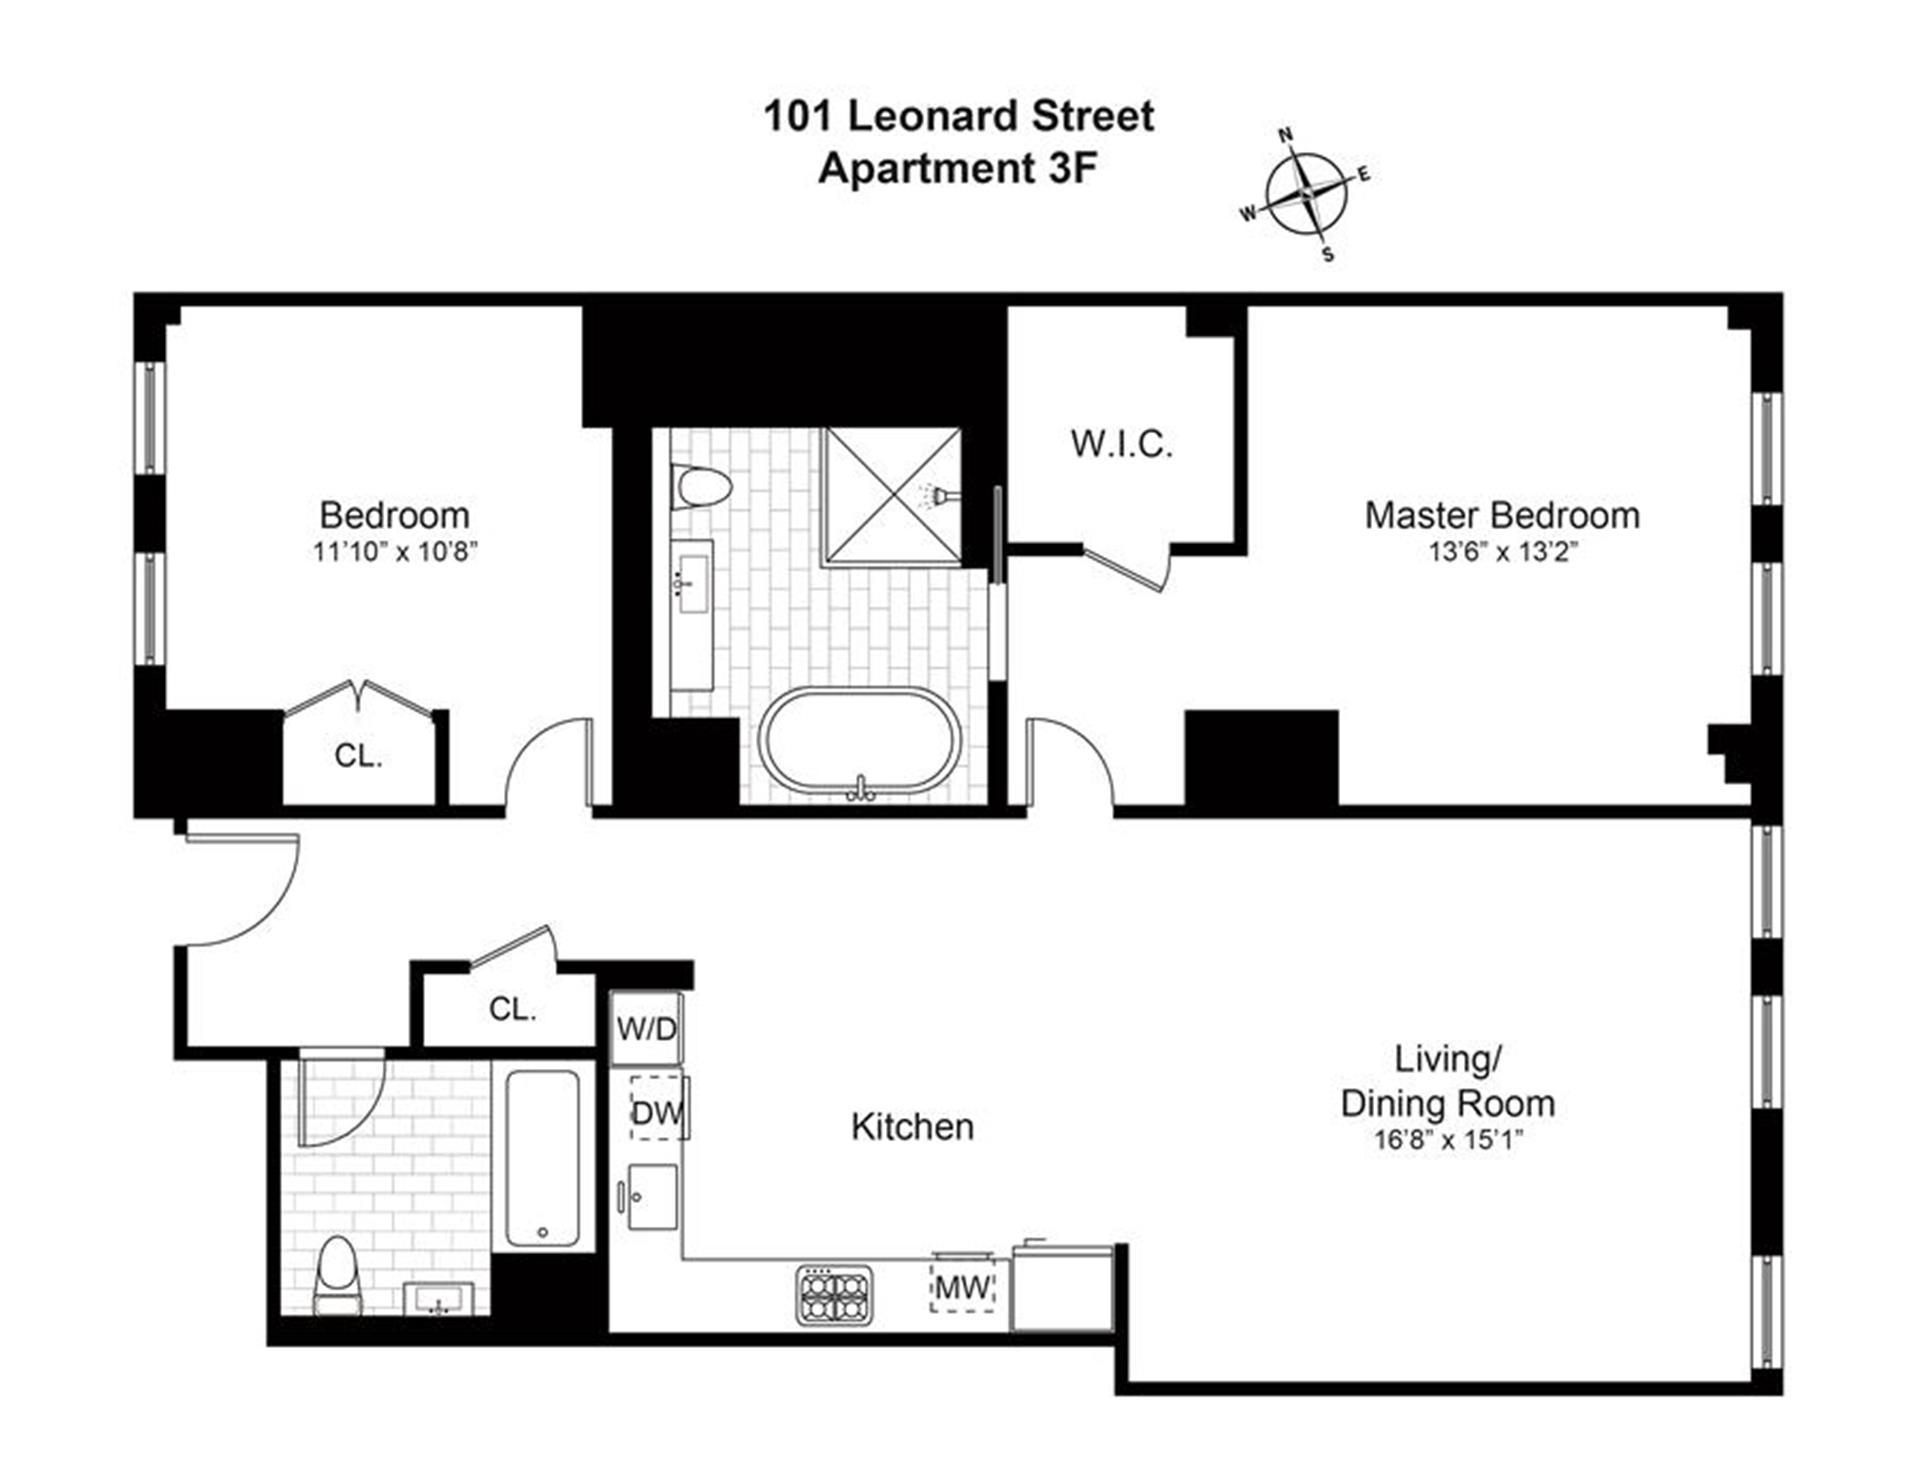 Floor plan of The Leonard, 101 Leonard St, 3F - TriBeCa, New York